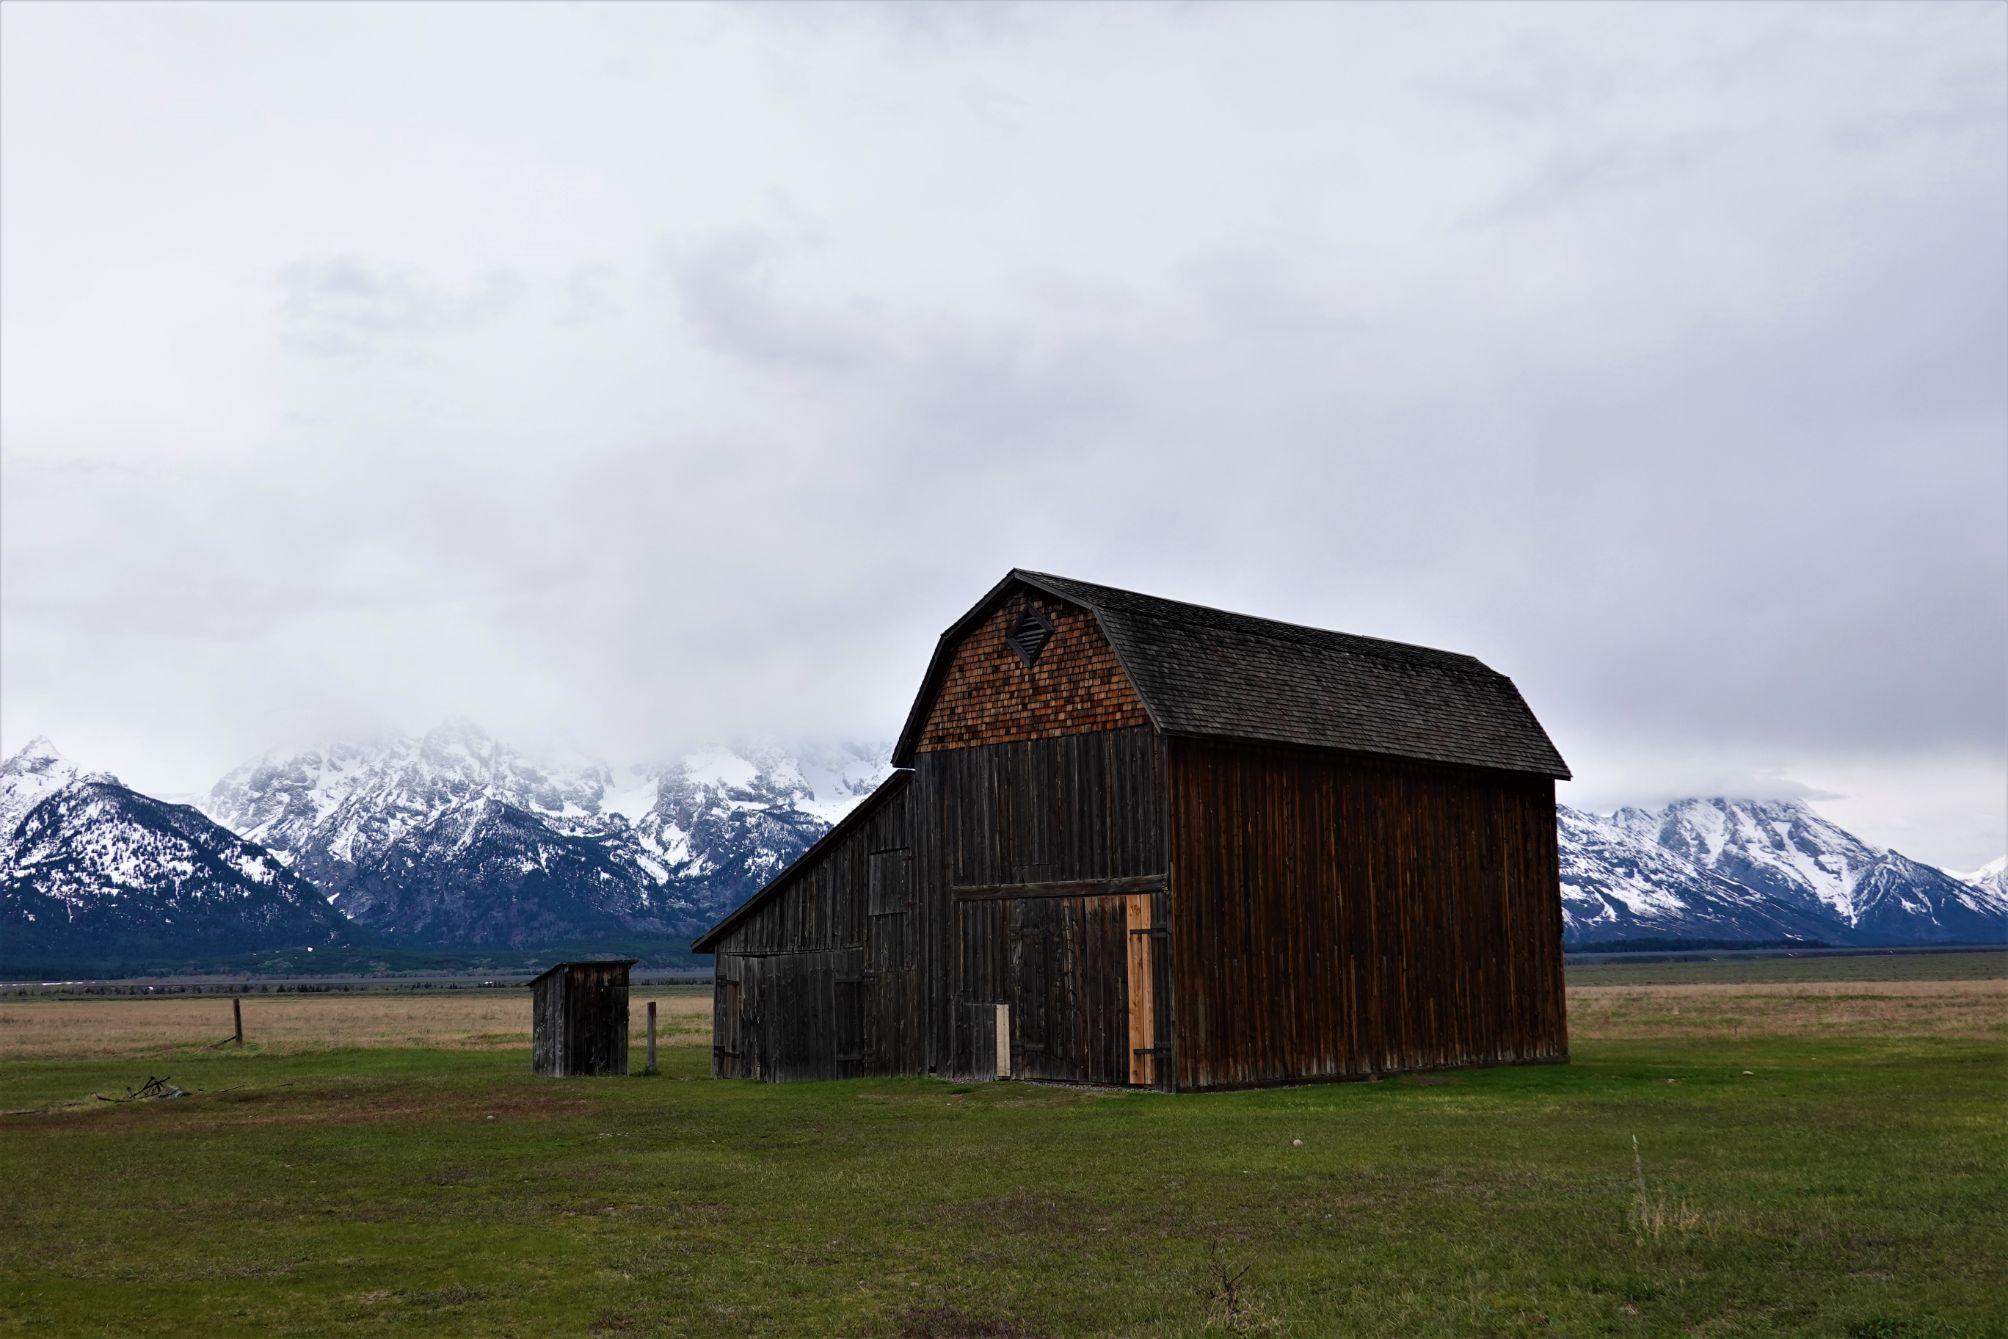 Mormonské stavby v NP Grand Teton